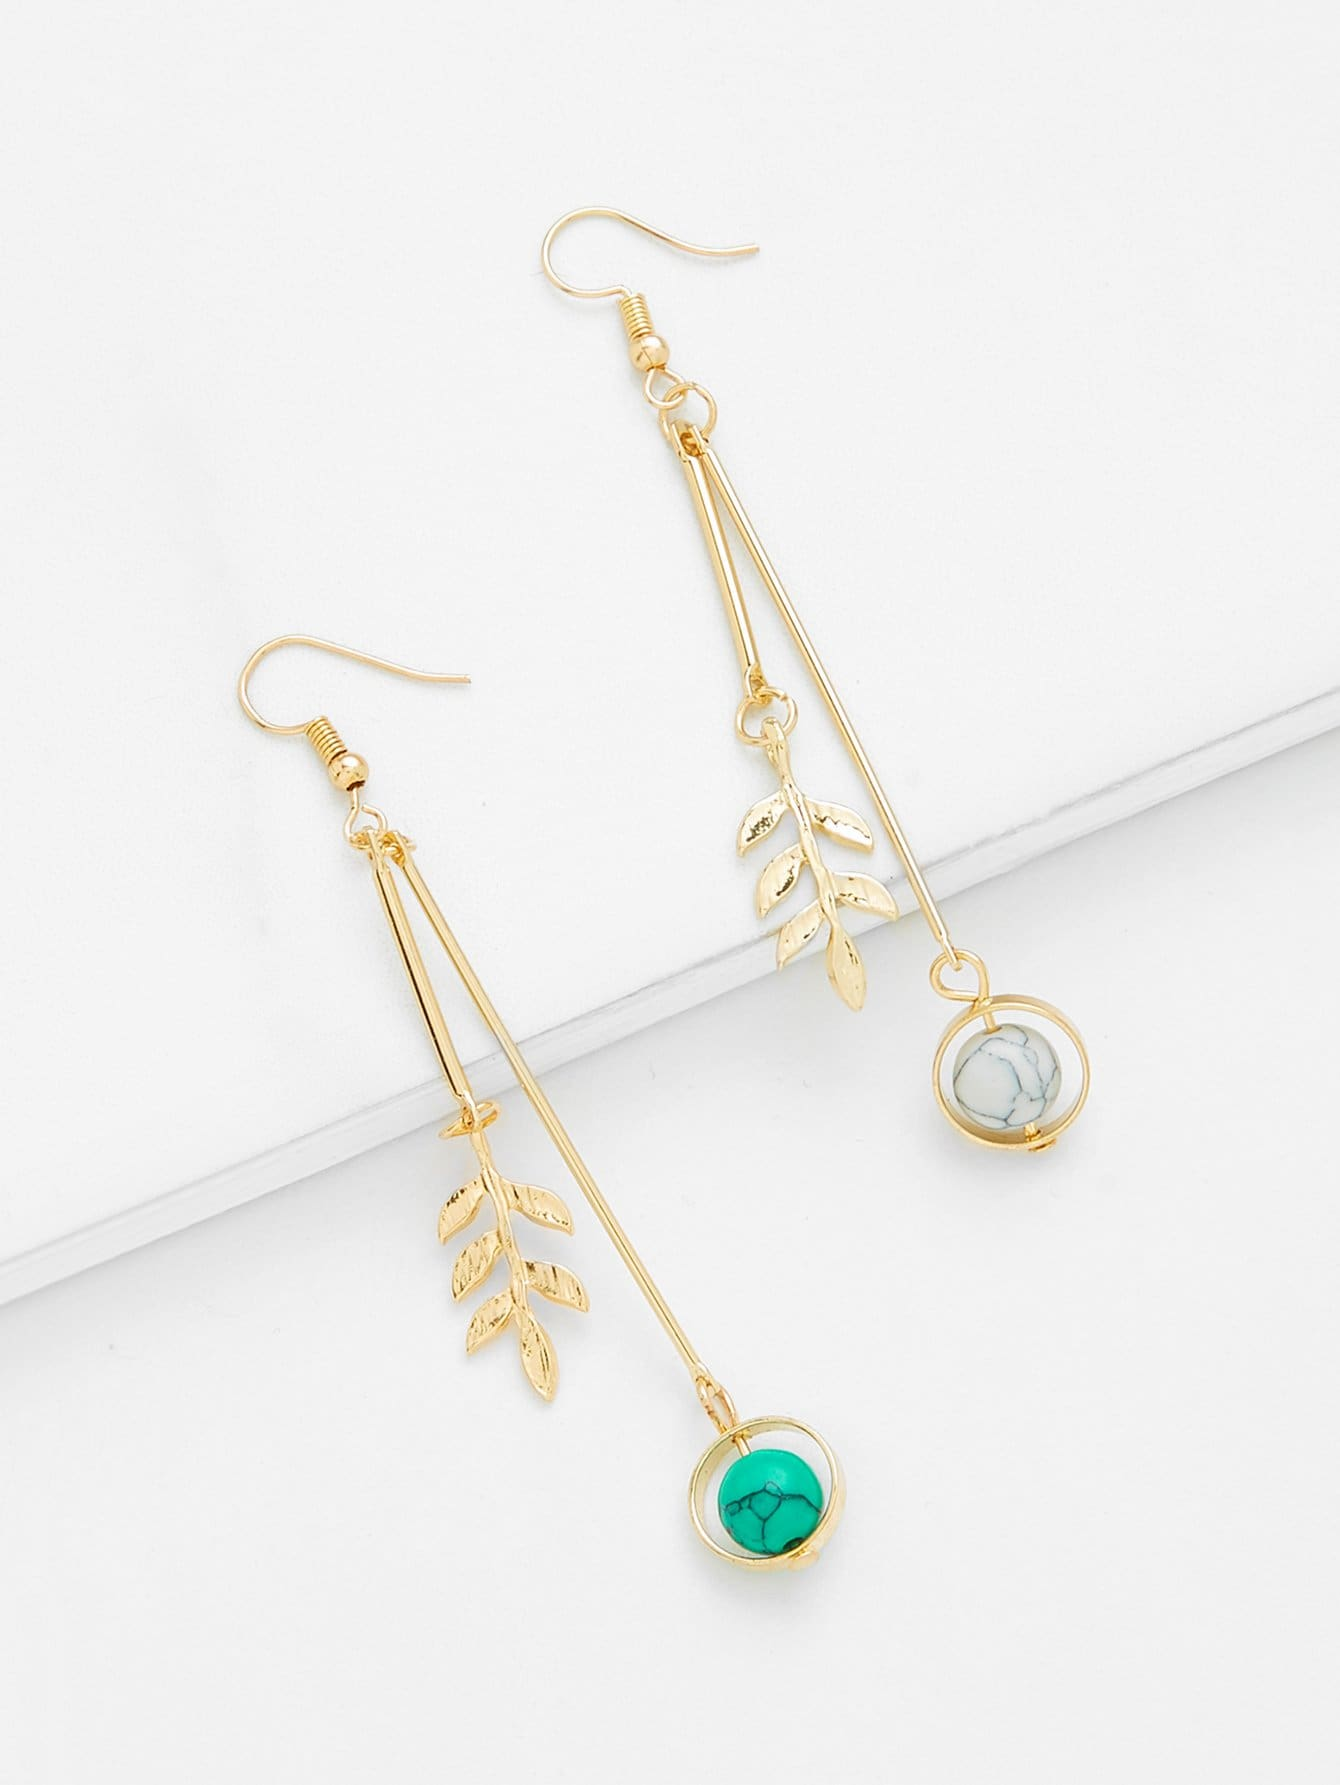 Bar & Hoop Drop Earrings silver plated bar dangle drop earrings